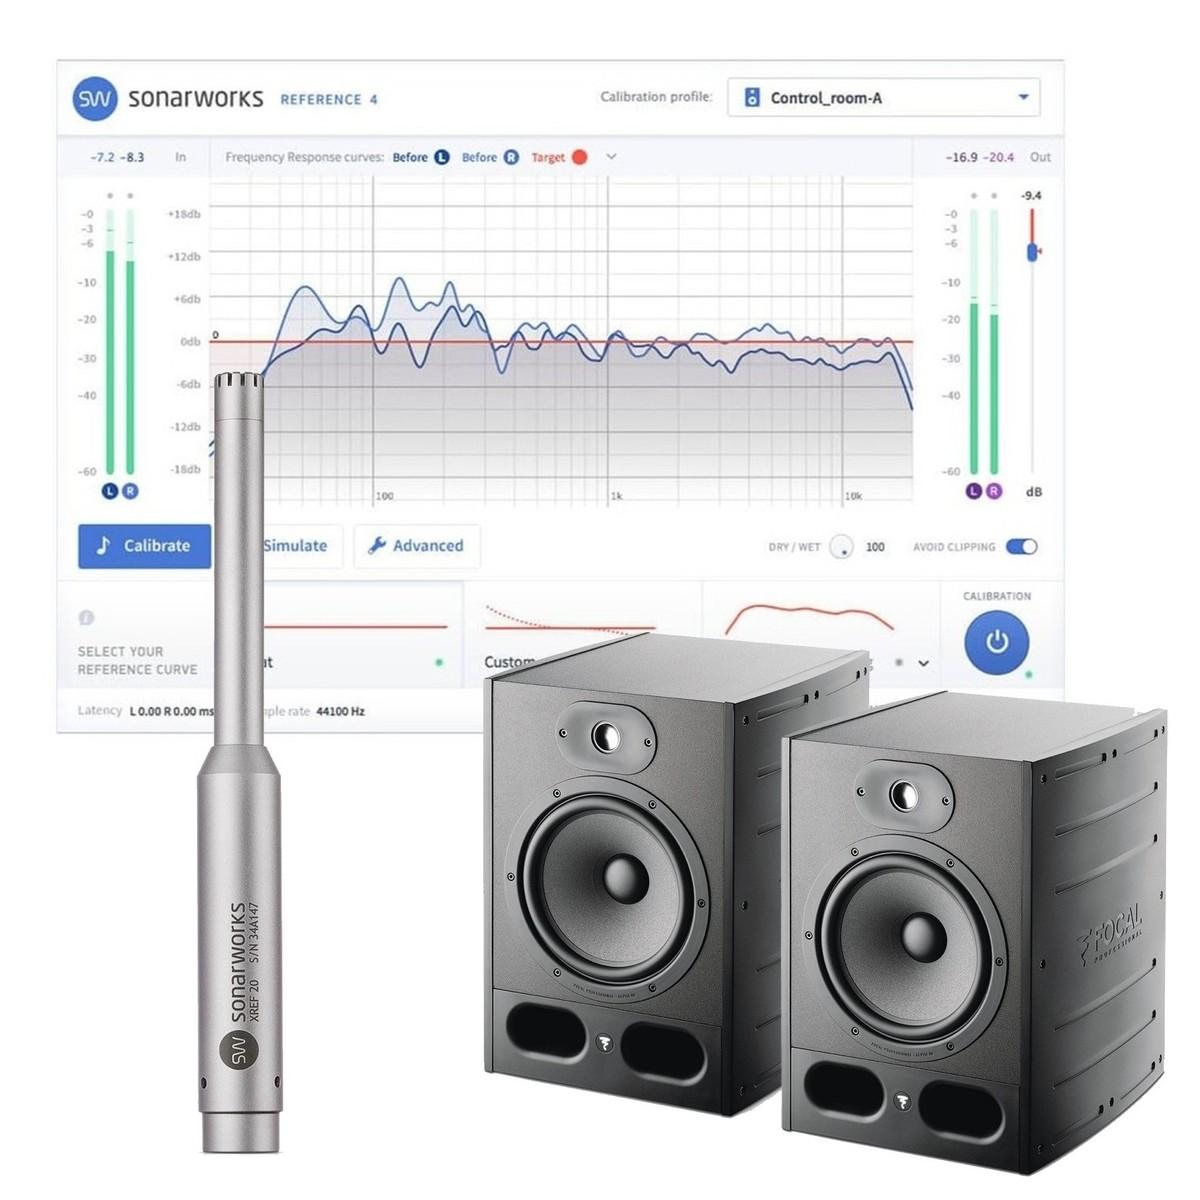 Sonarworks Reference 4 inkl. mikrofon | FINN.no